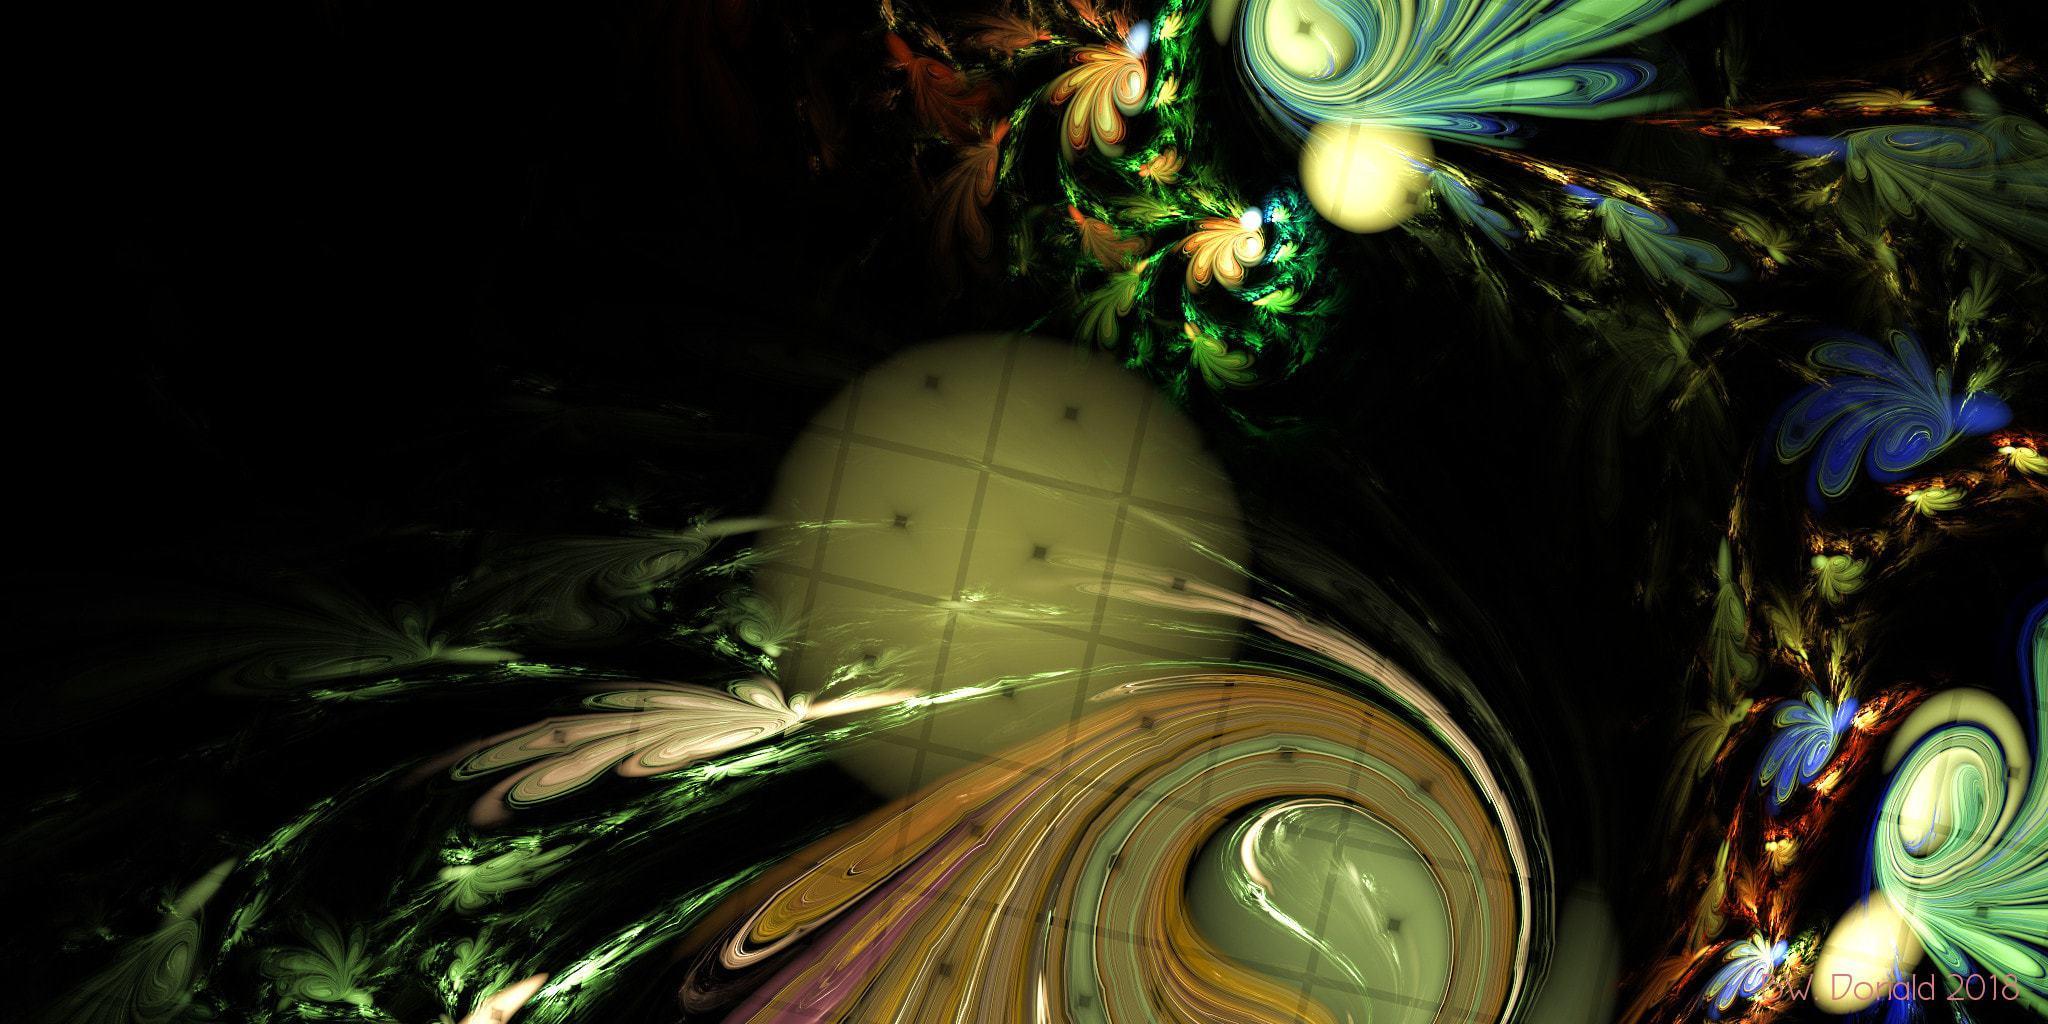 Cosmic Lawn Bowls II | Cosmic Lawn Bowls II